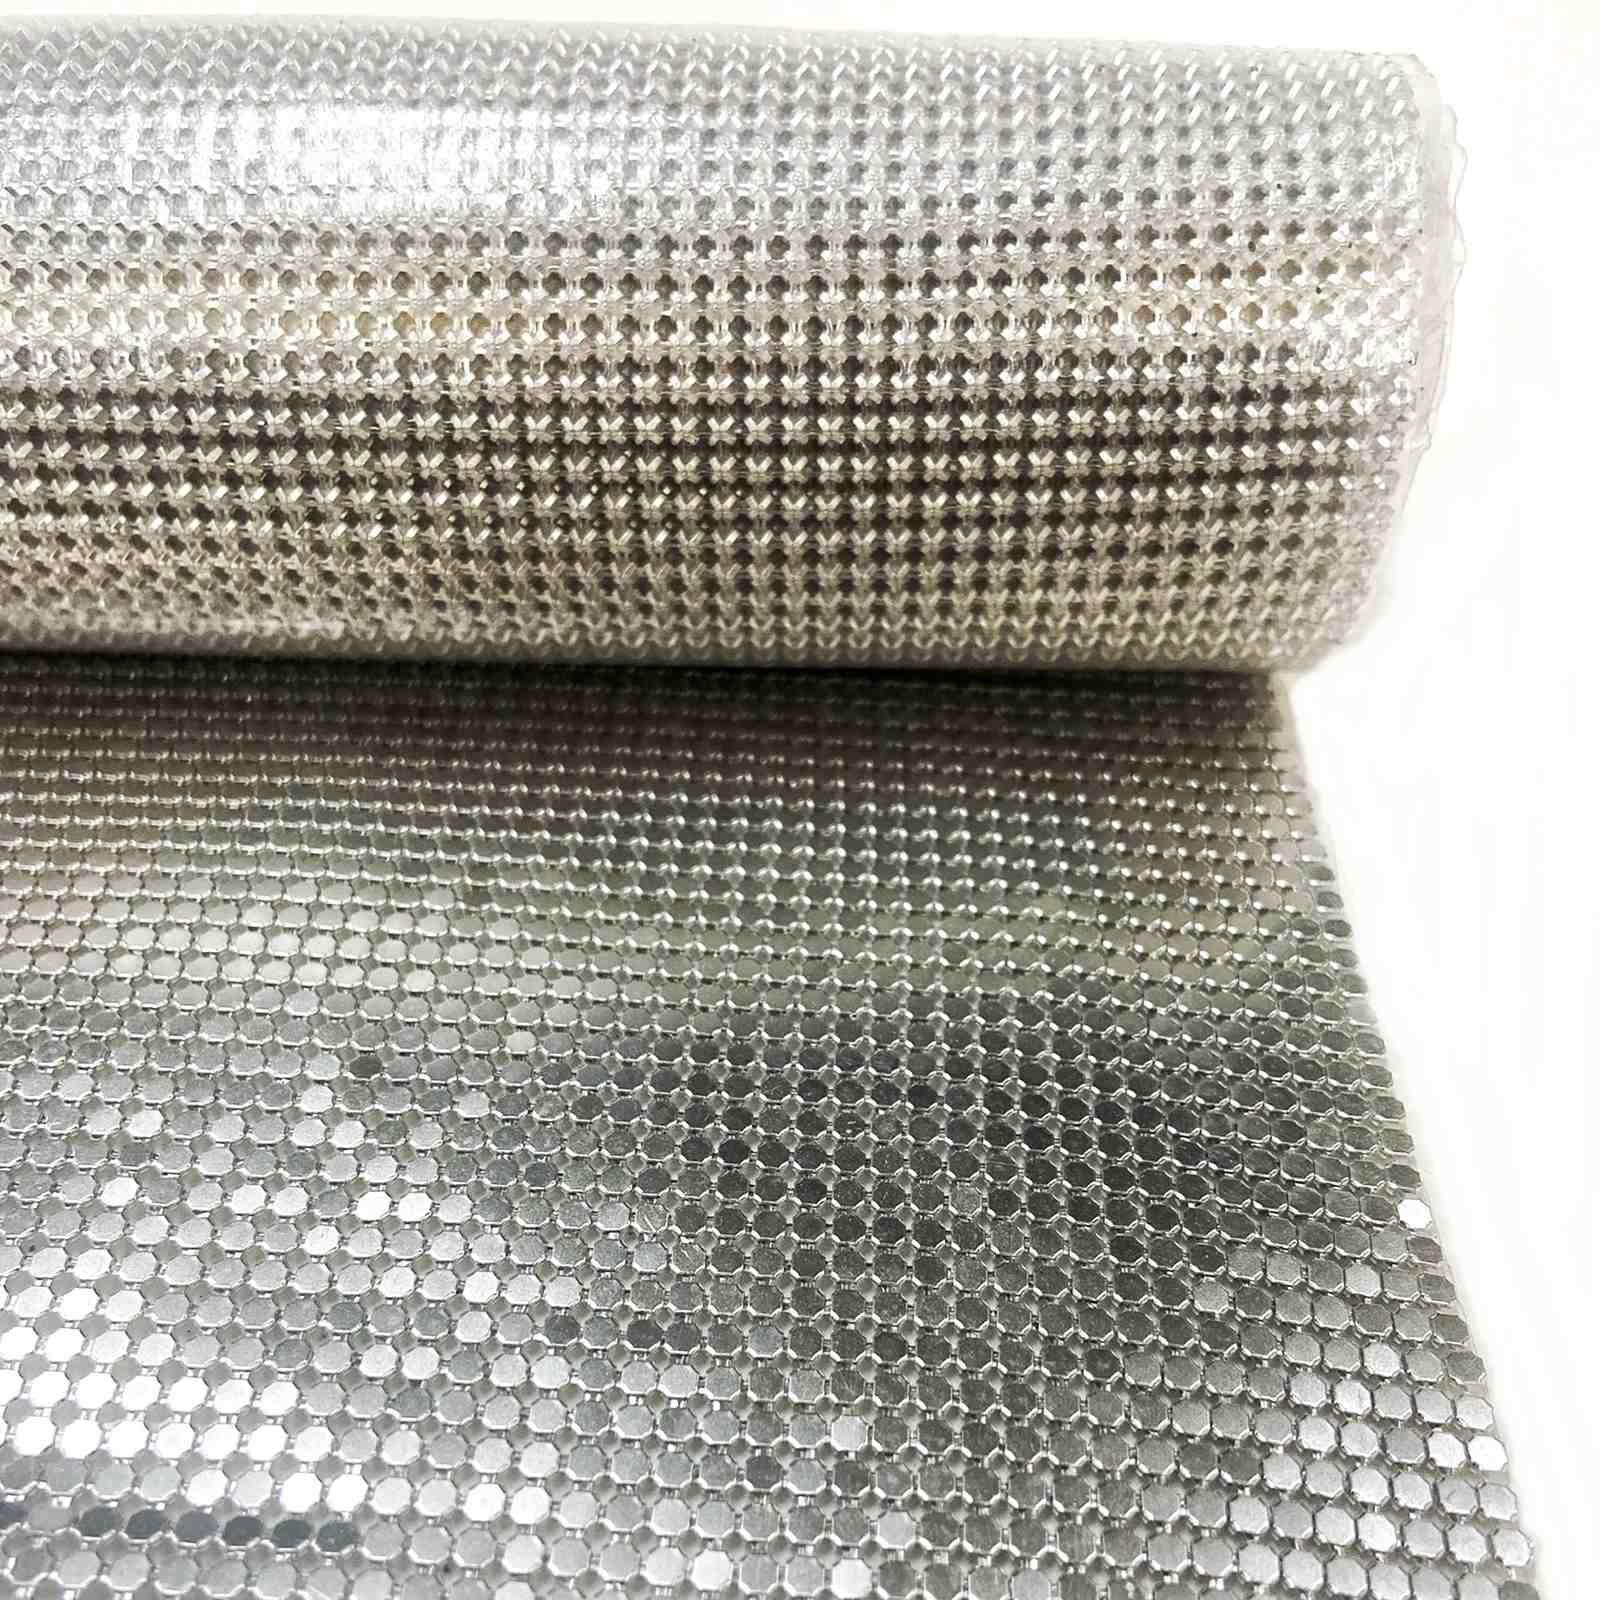 Manta Flex 2x2mm (1,60m x 50cm) - Níquel (Base de Silicone)